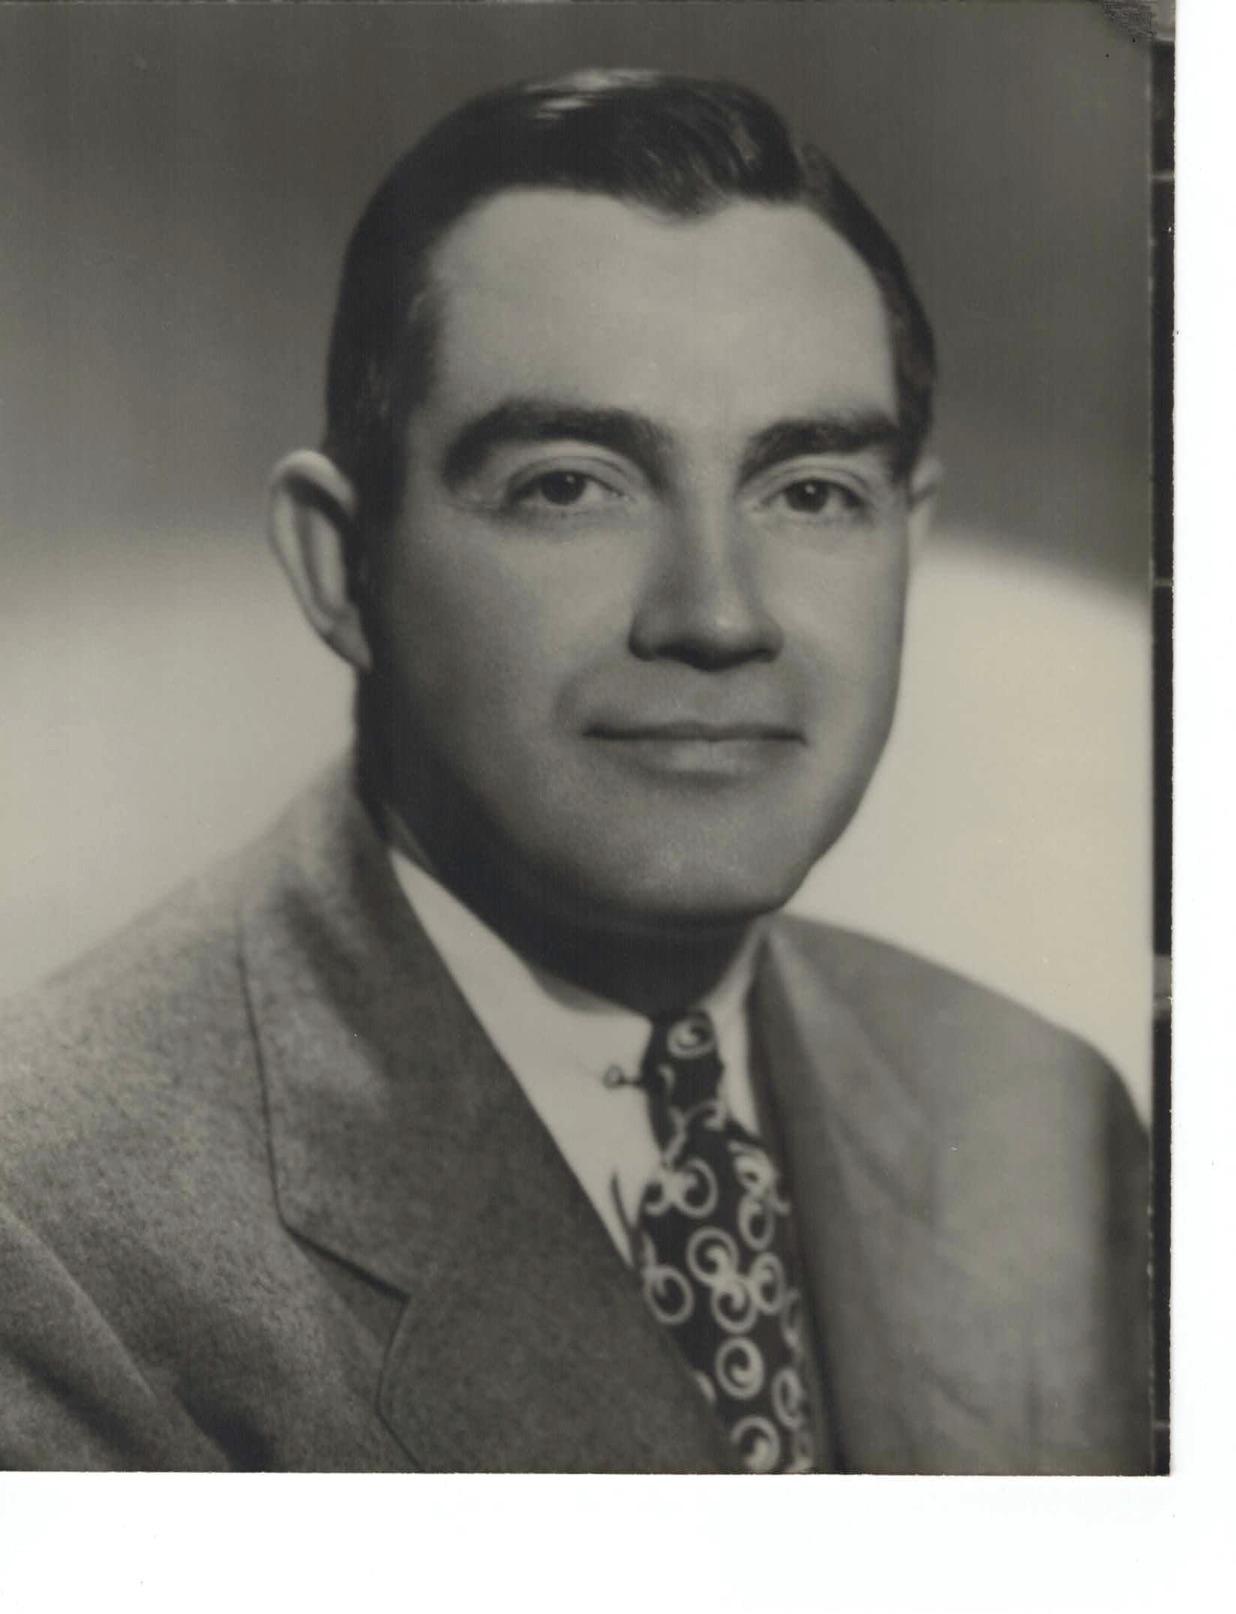 DALLAS DONNAN 1944-45